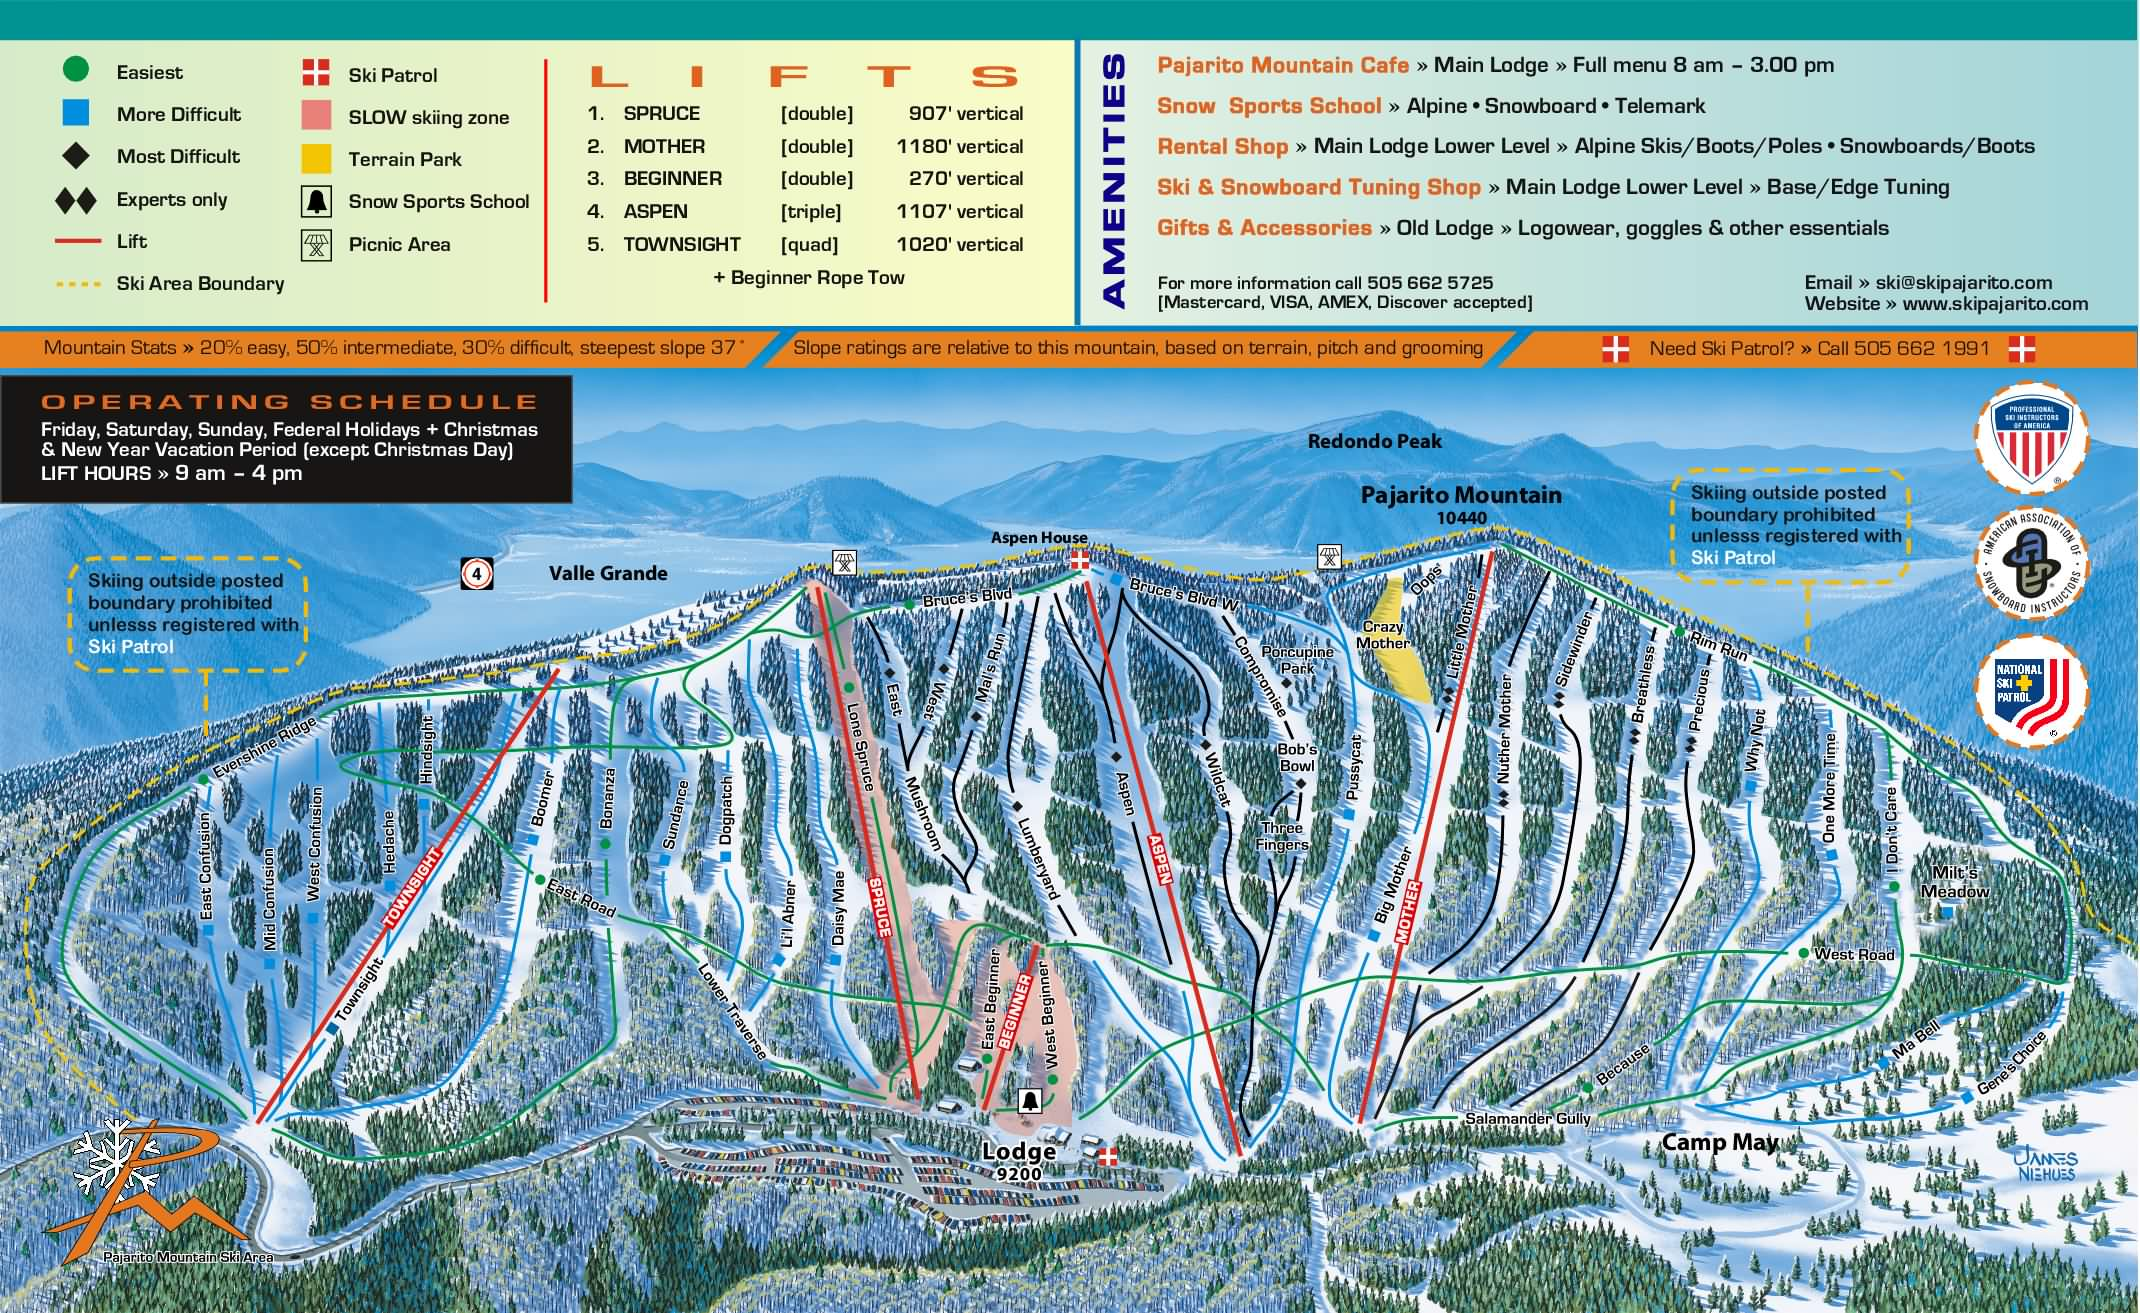 pajarito mountain ski trail map los alamos new mexico united states mappery